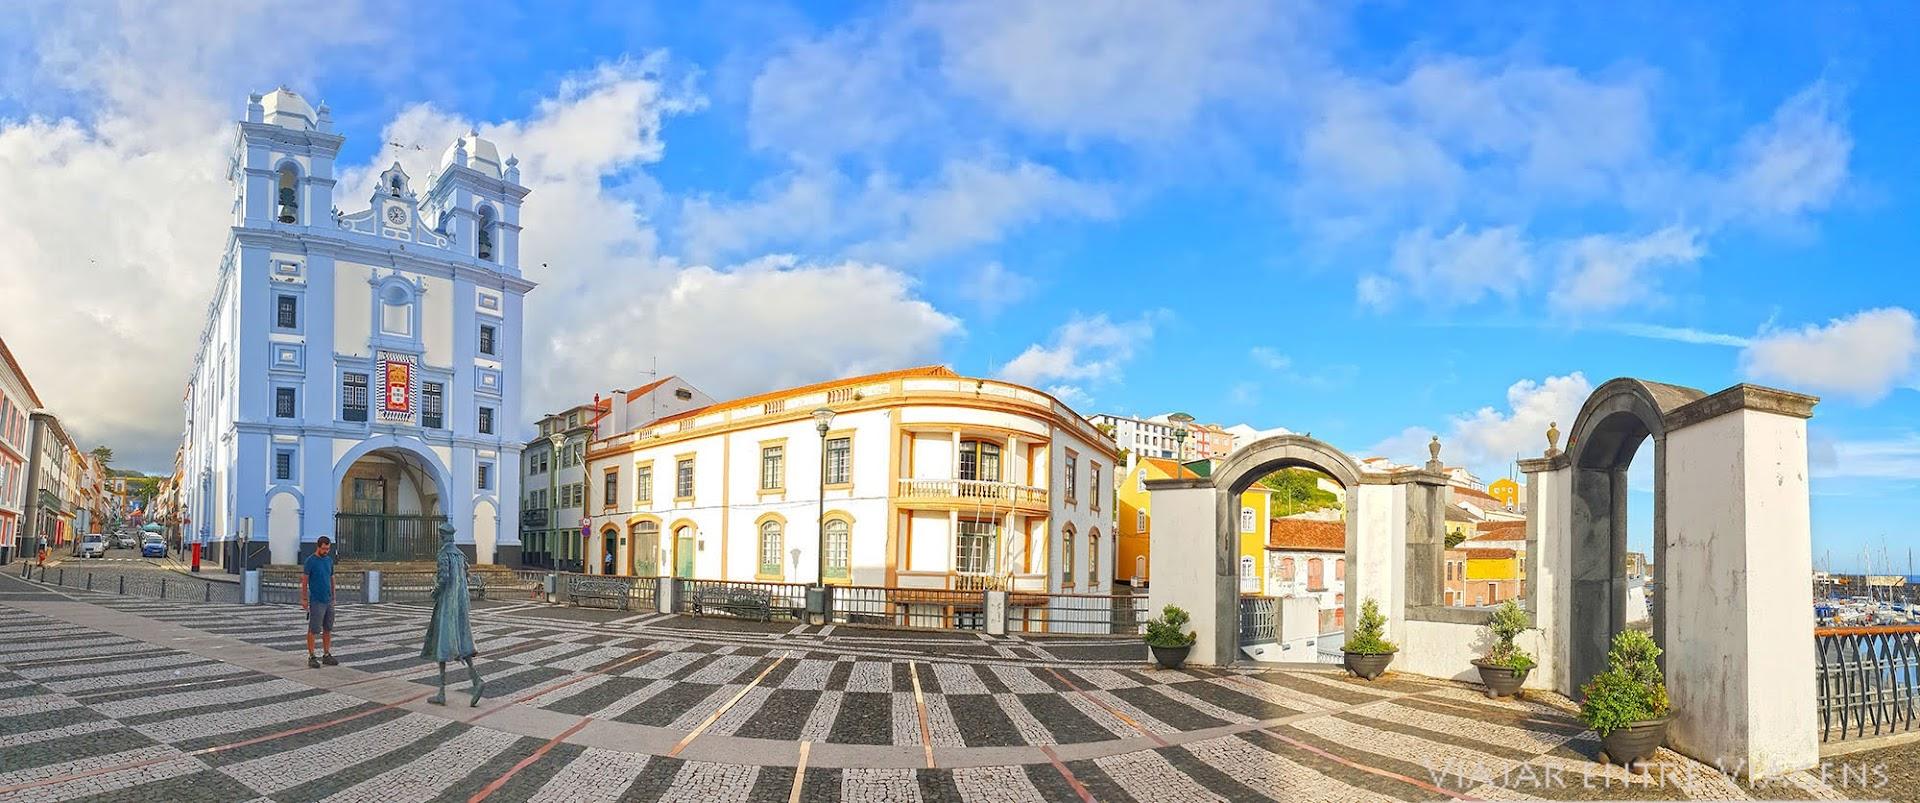 Visitar Angra do Heroísmo, na ilha Terceira